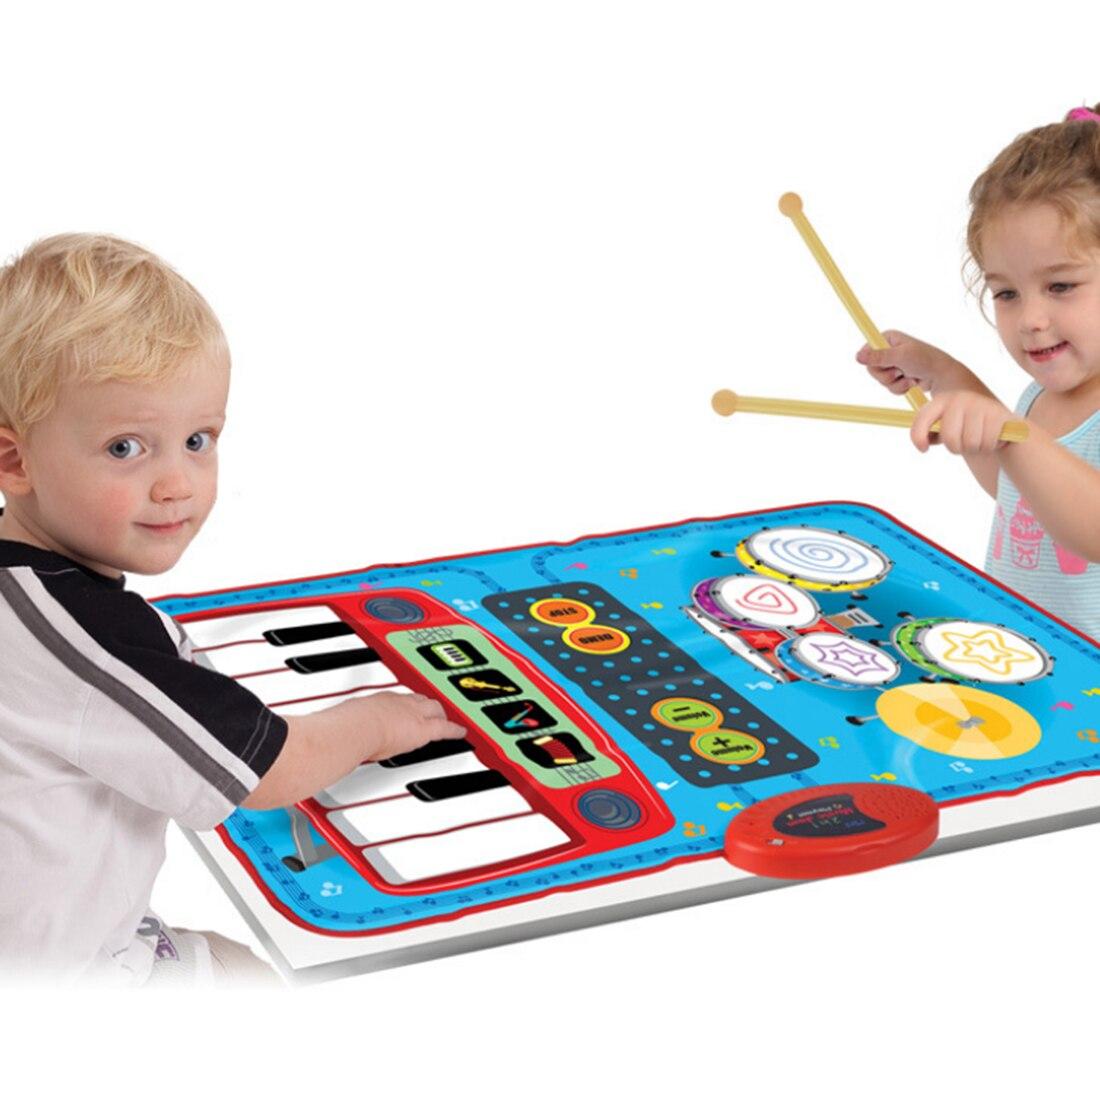 Batería Piano En Tambor Musical Educativa Baterias Toque Música Mini 2 Alfombra Juguetes De 1 EW2DI9YH